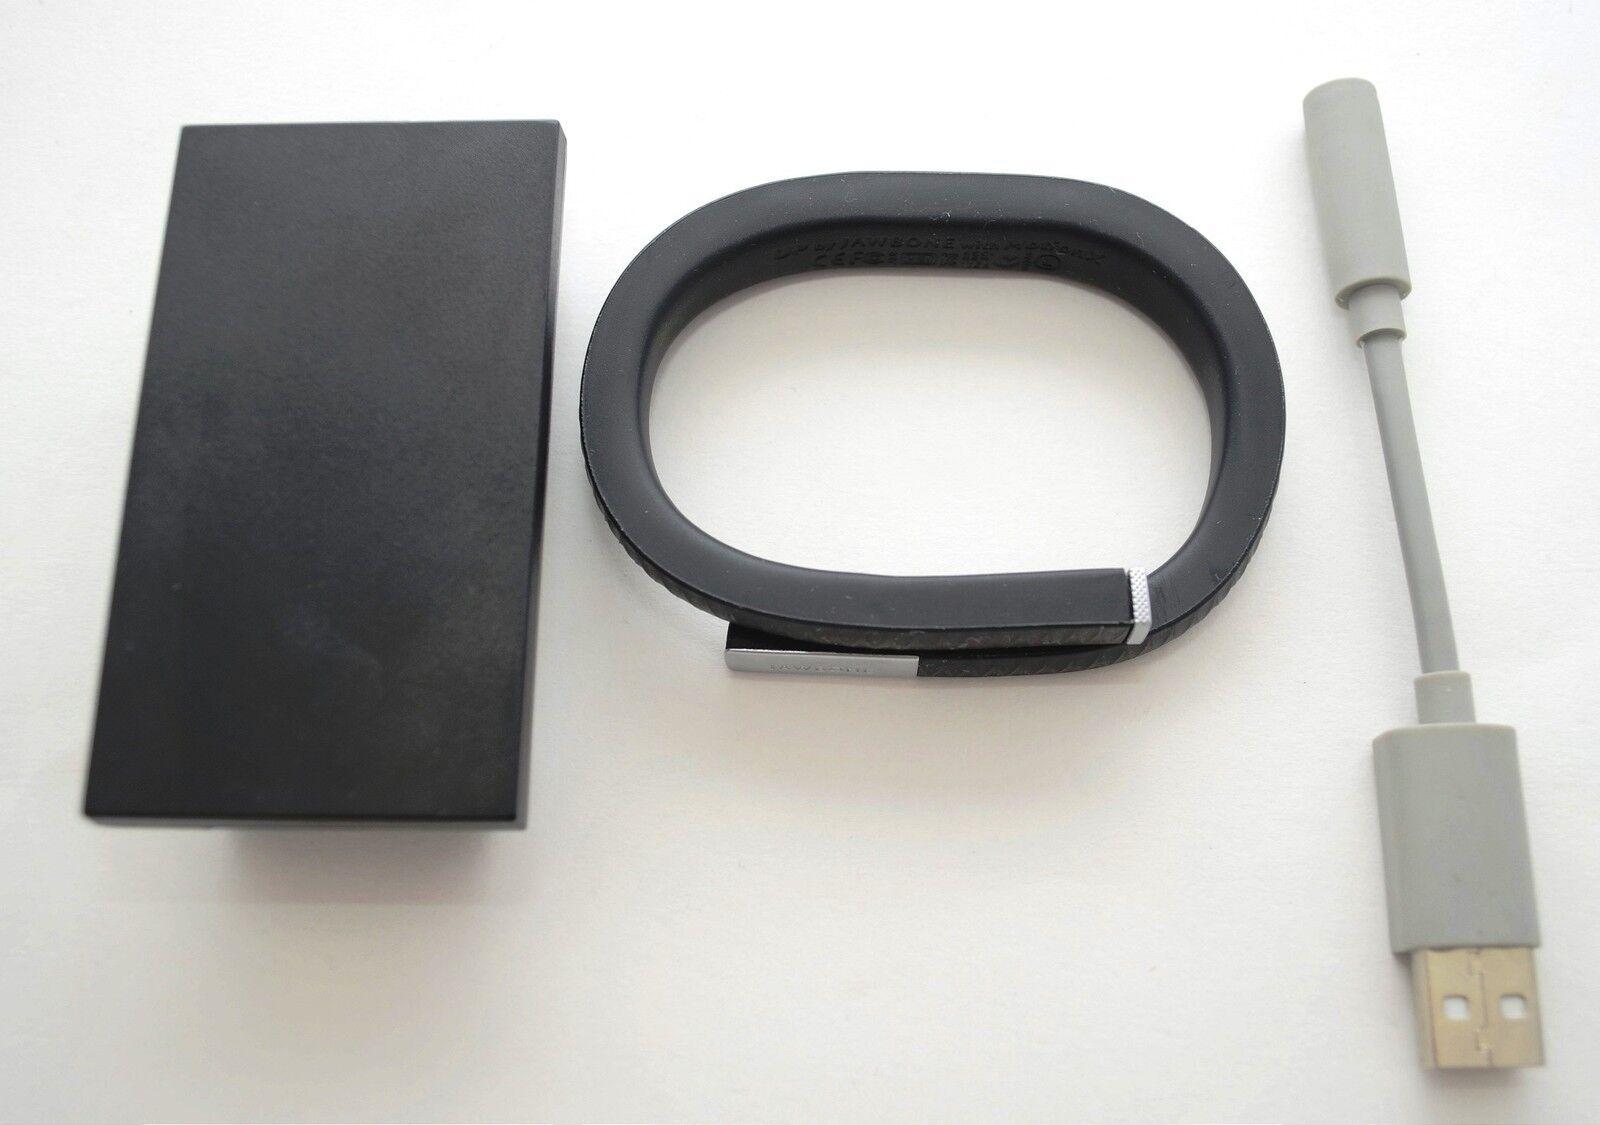 Jawbone UP Wristband LARGE Black Onyx 2nd Gen Fitness Diet Tracker Bracelet band